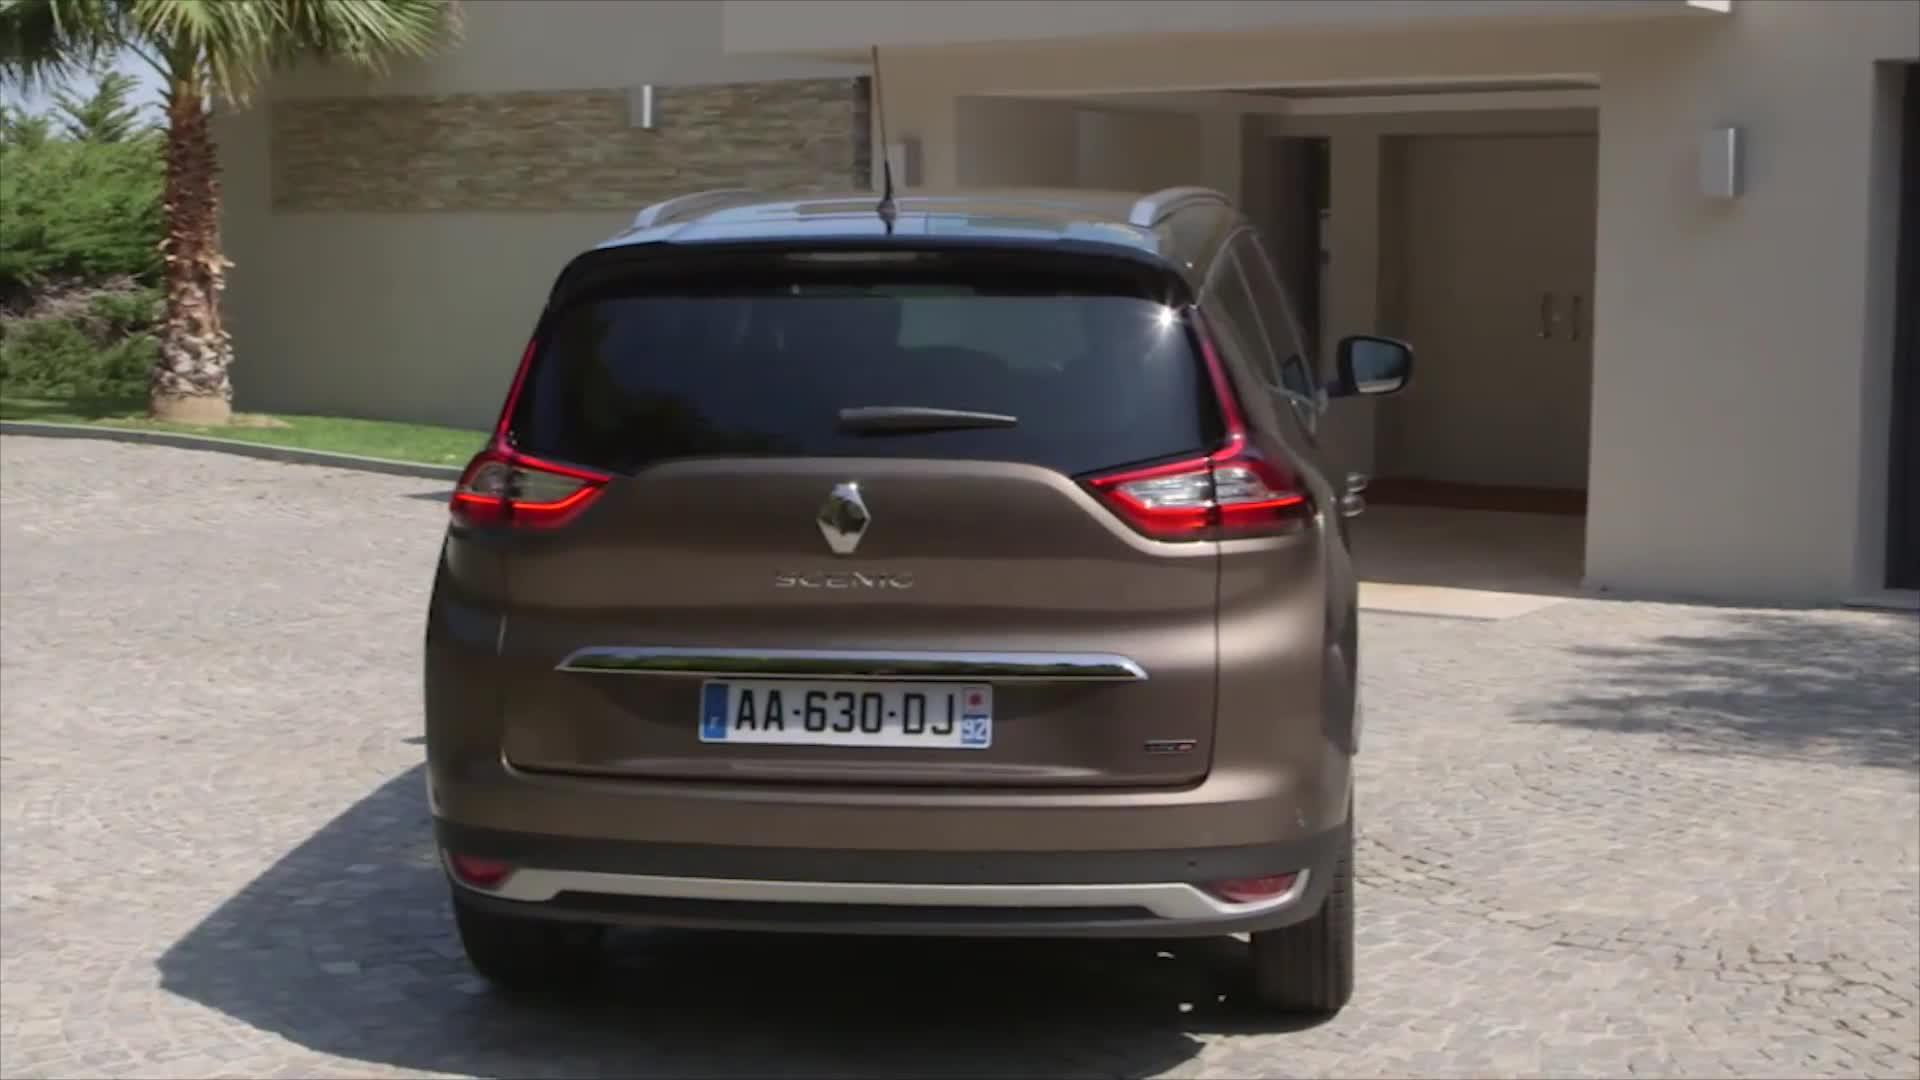 New 2016 Renault GRAND SCENIC - Exterior